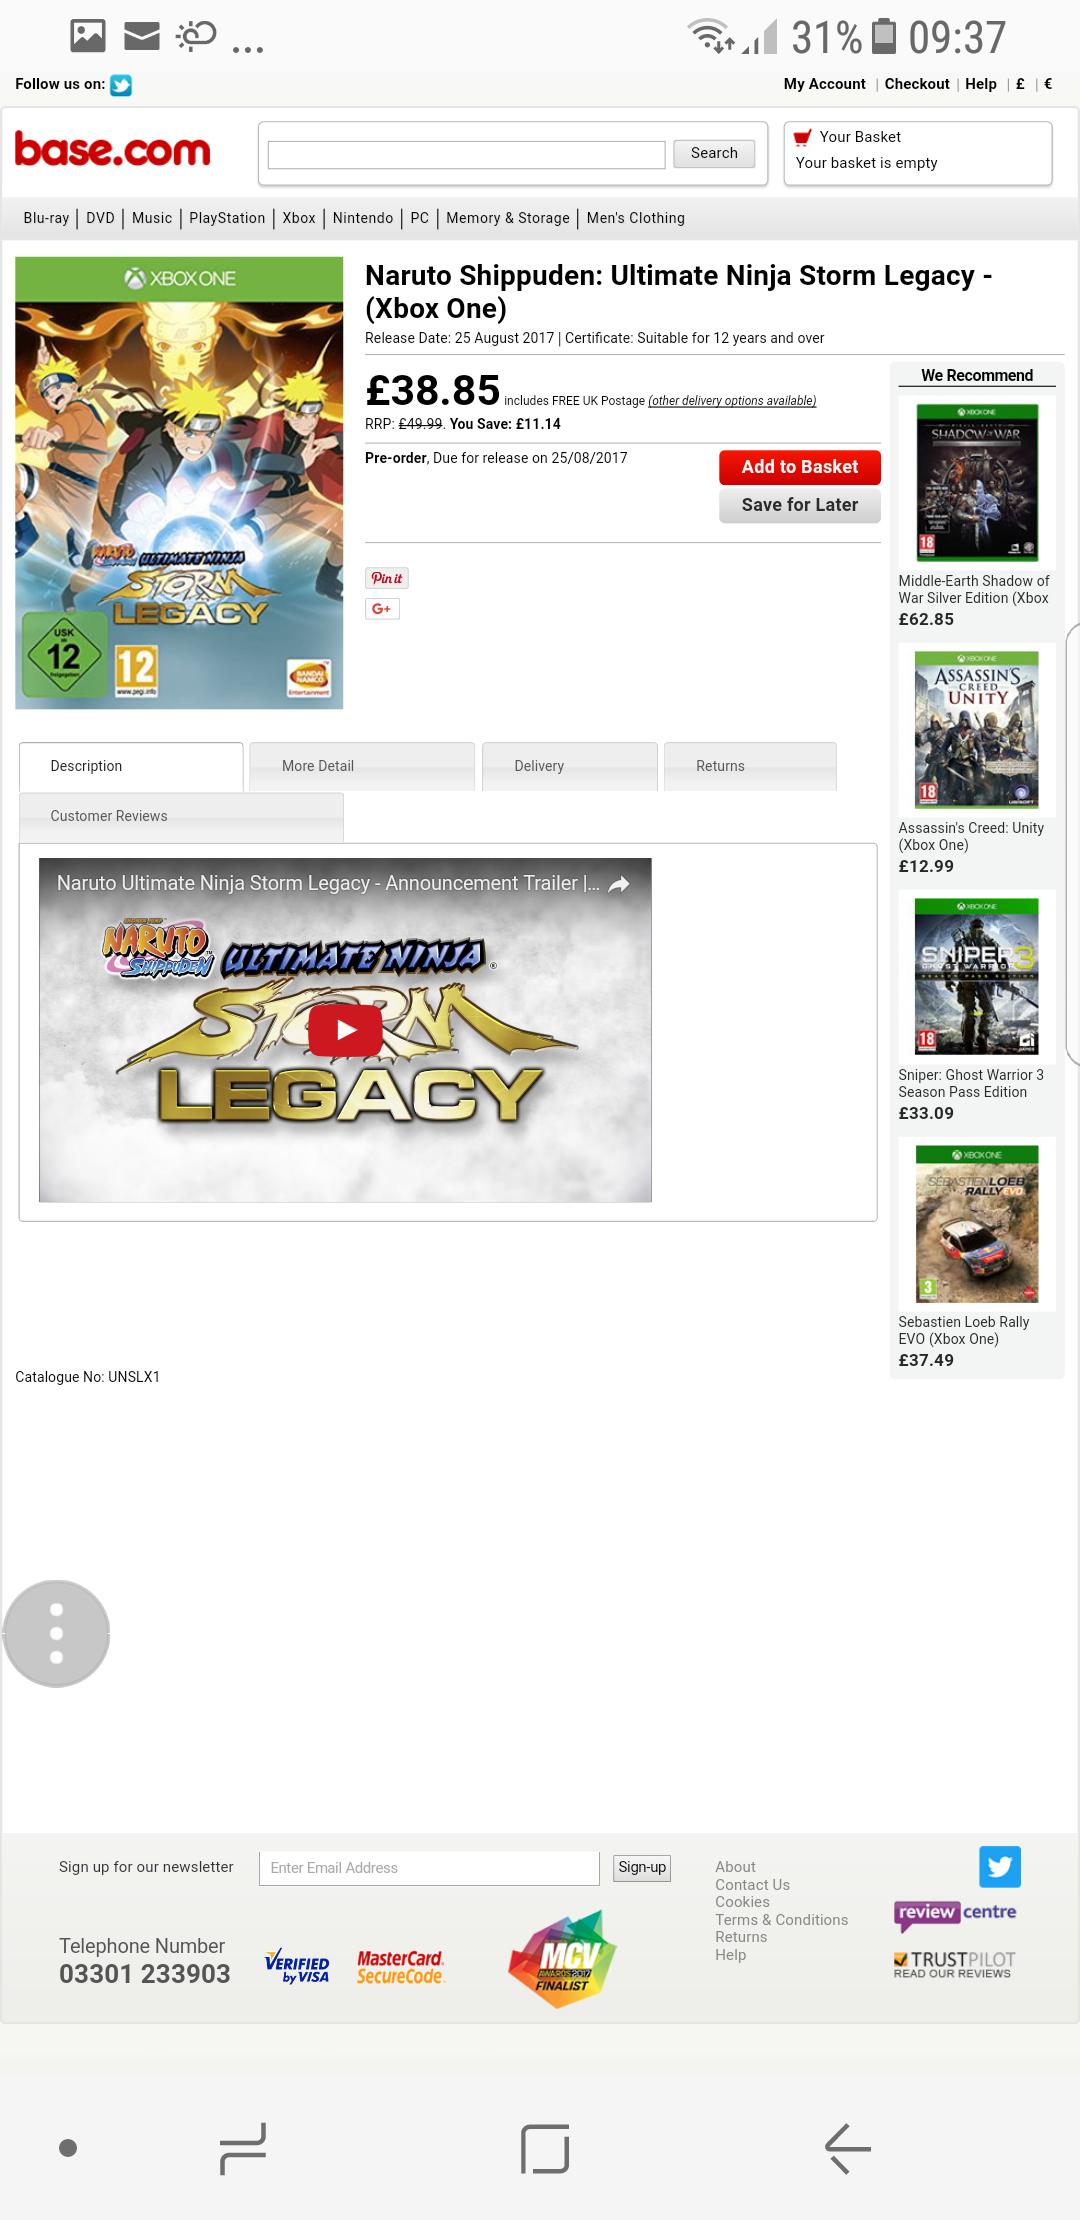 Naruto Shippuden: Ultimate Ninja Storm Legacy - (Xbox One) £38.85 at Base.com